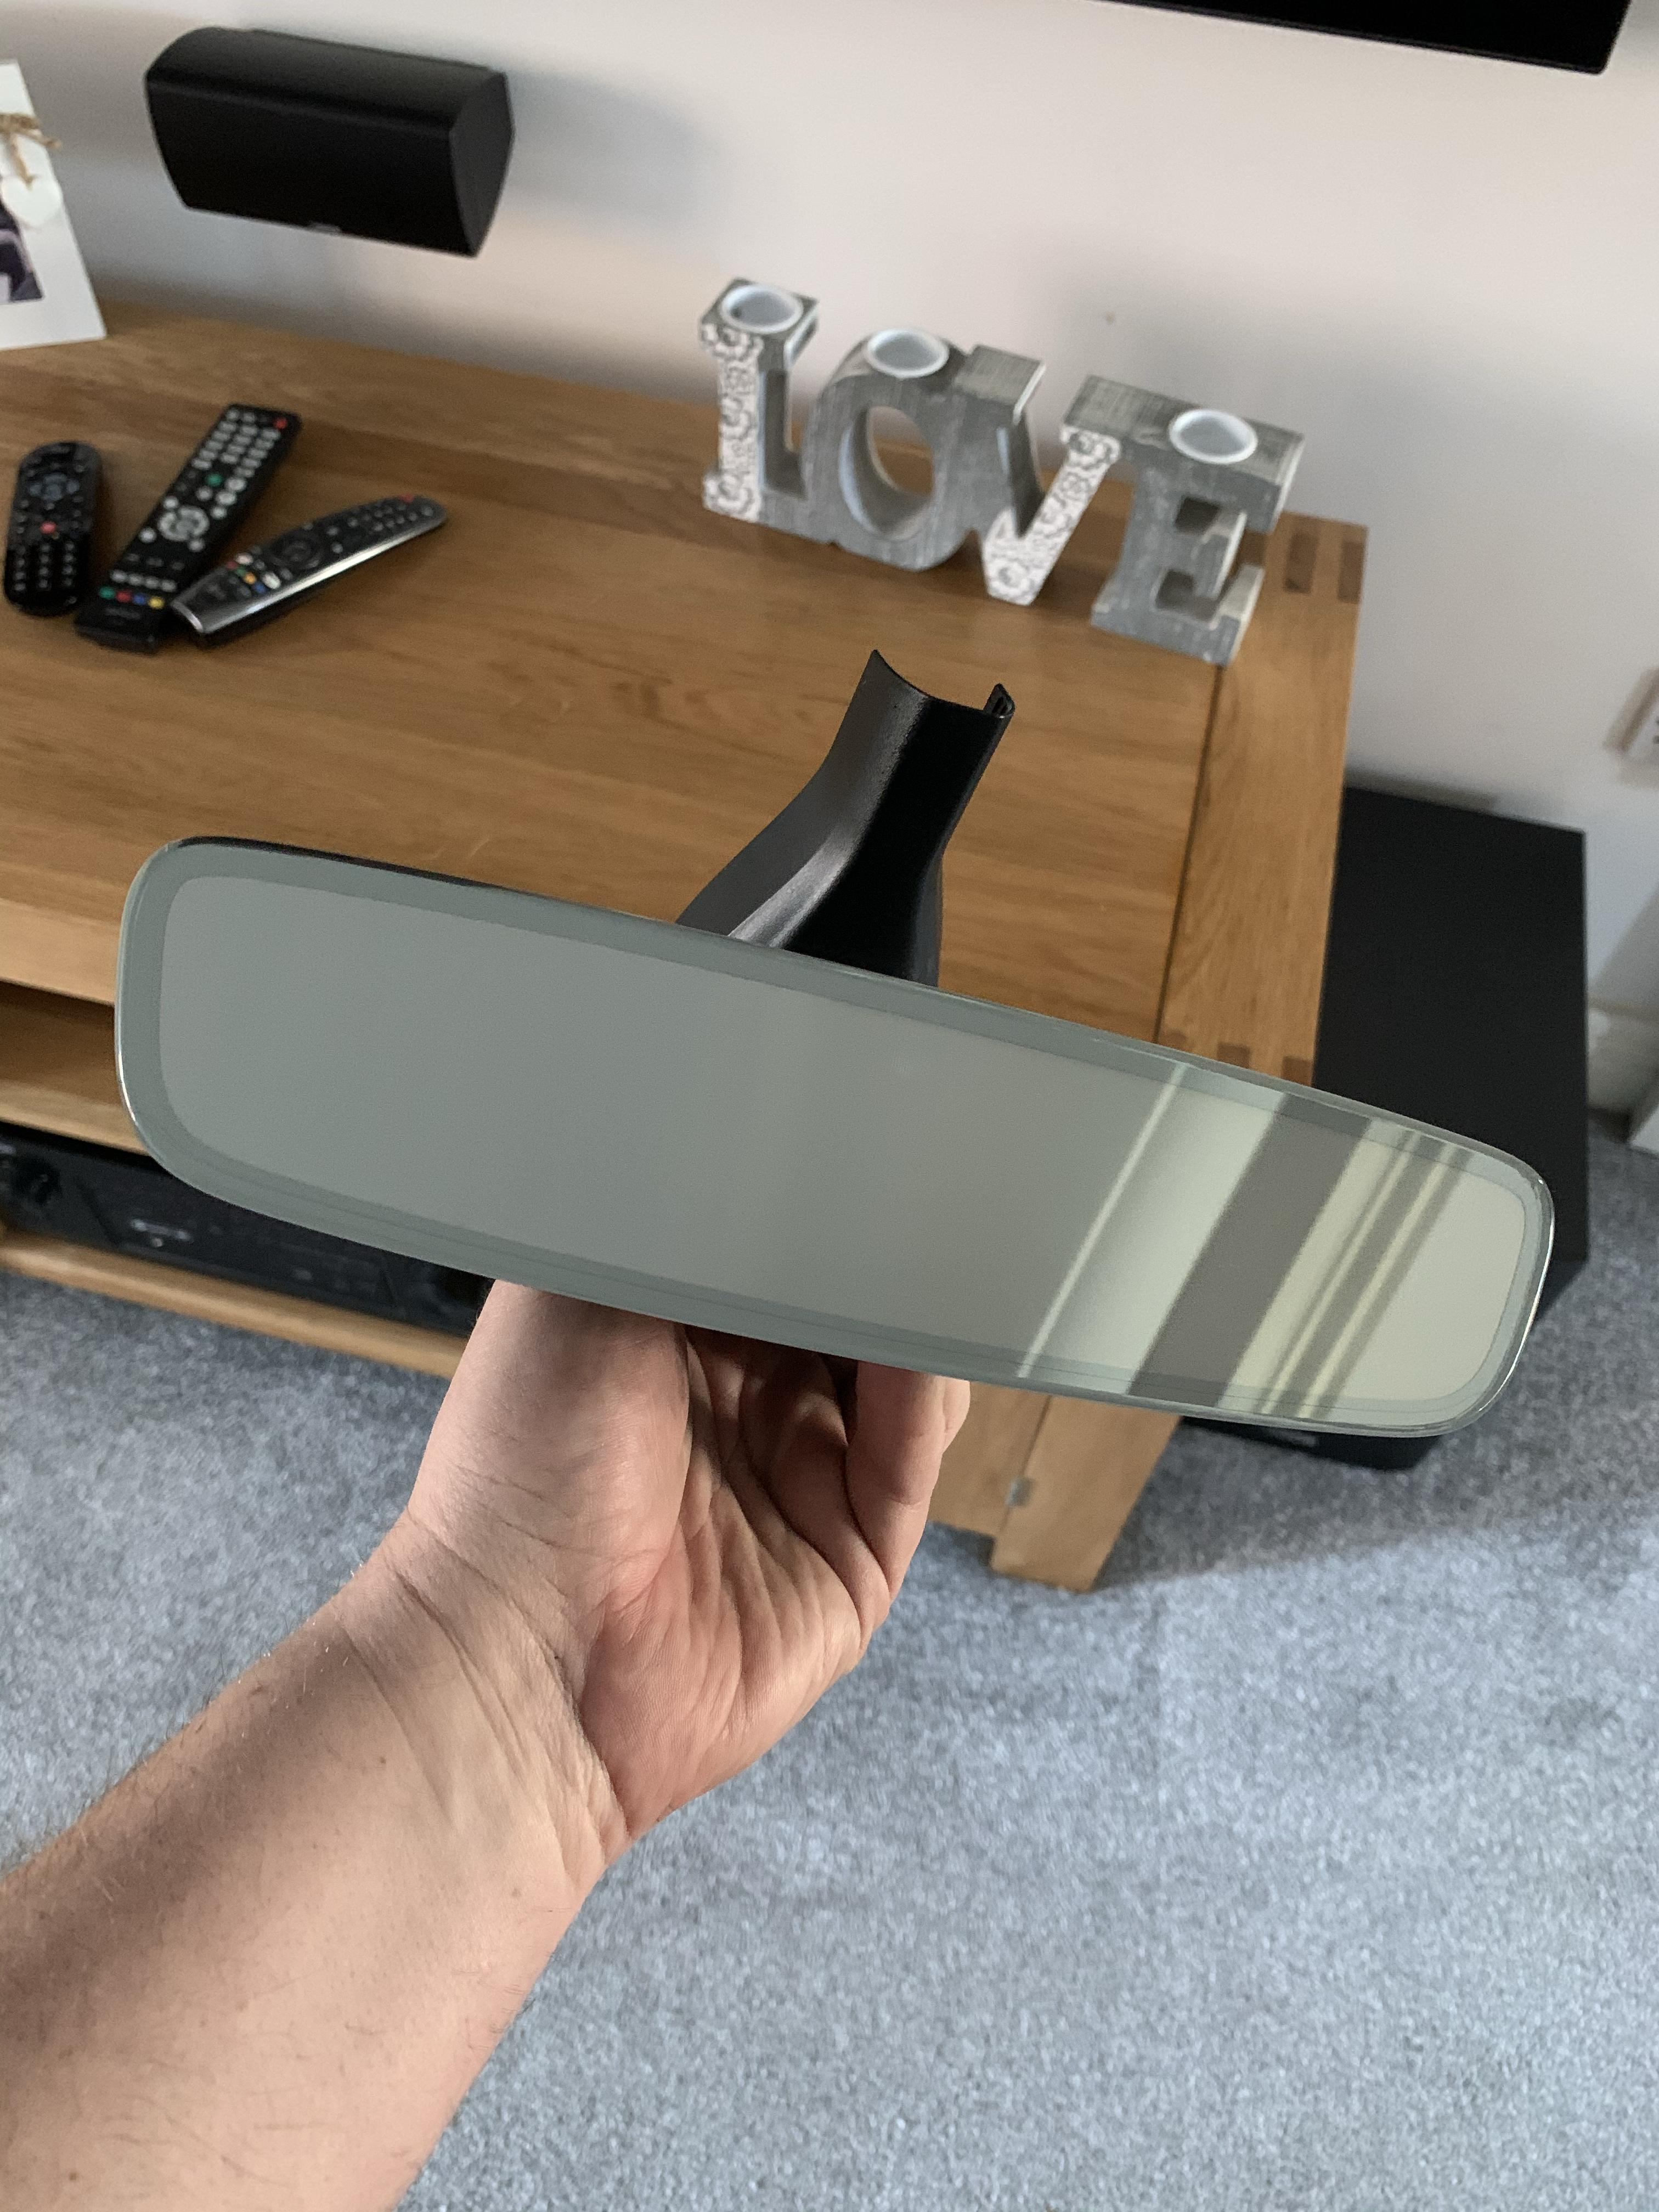 Audi S3 8p Auto Dimming Rear View Mirror Retrofit